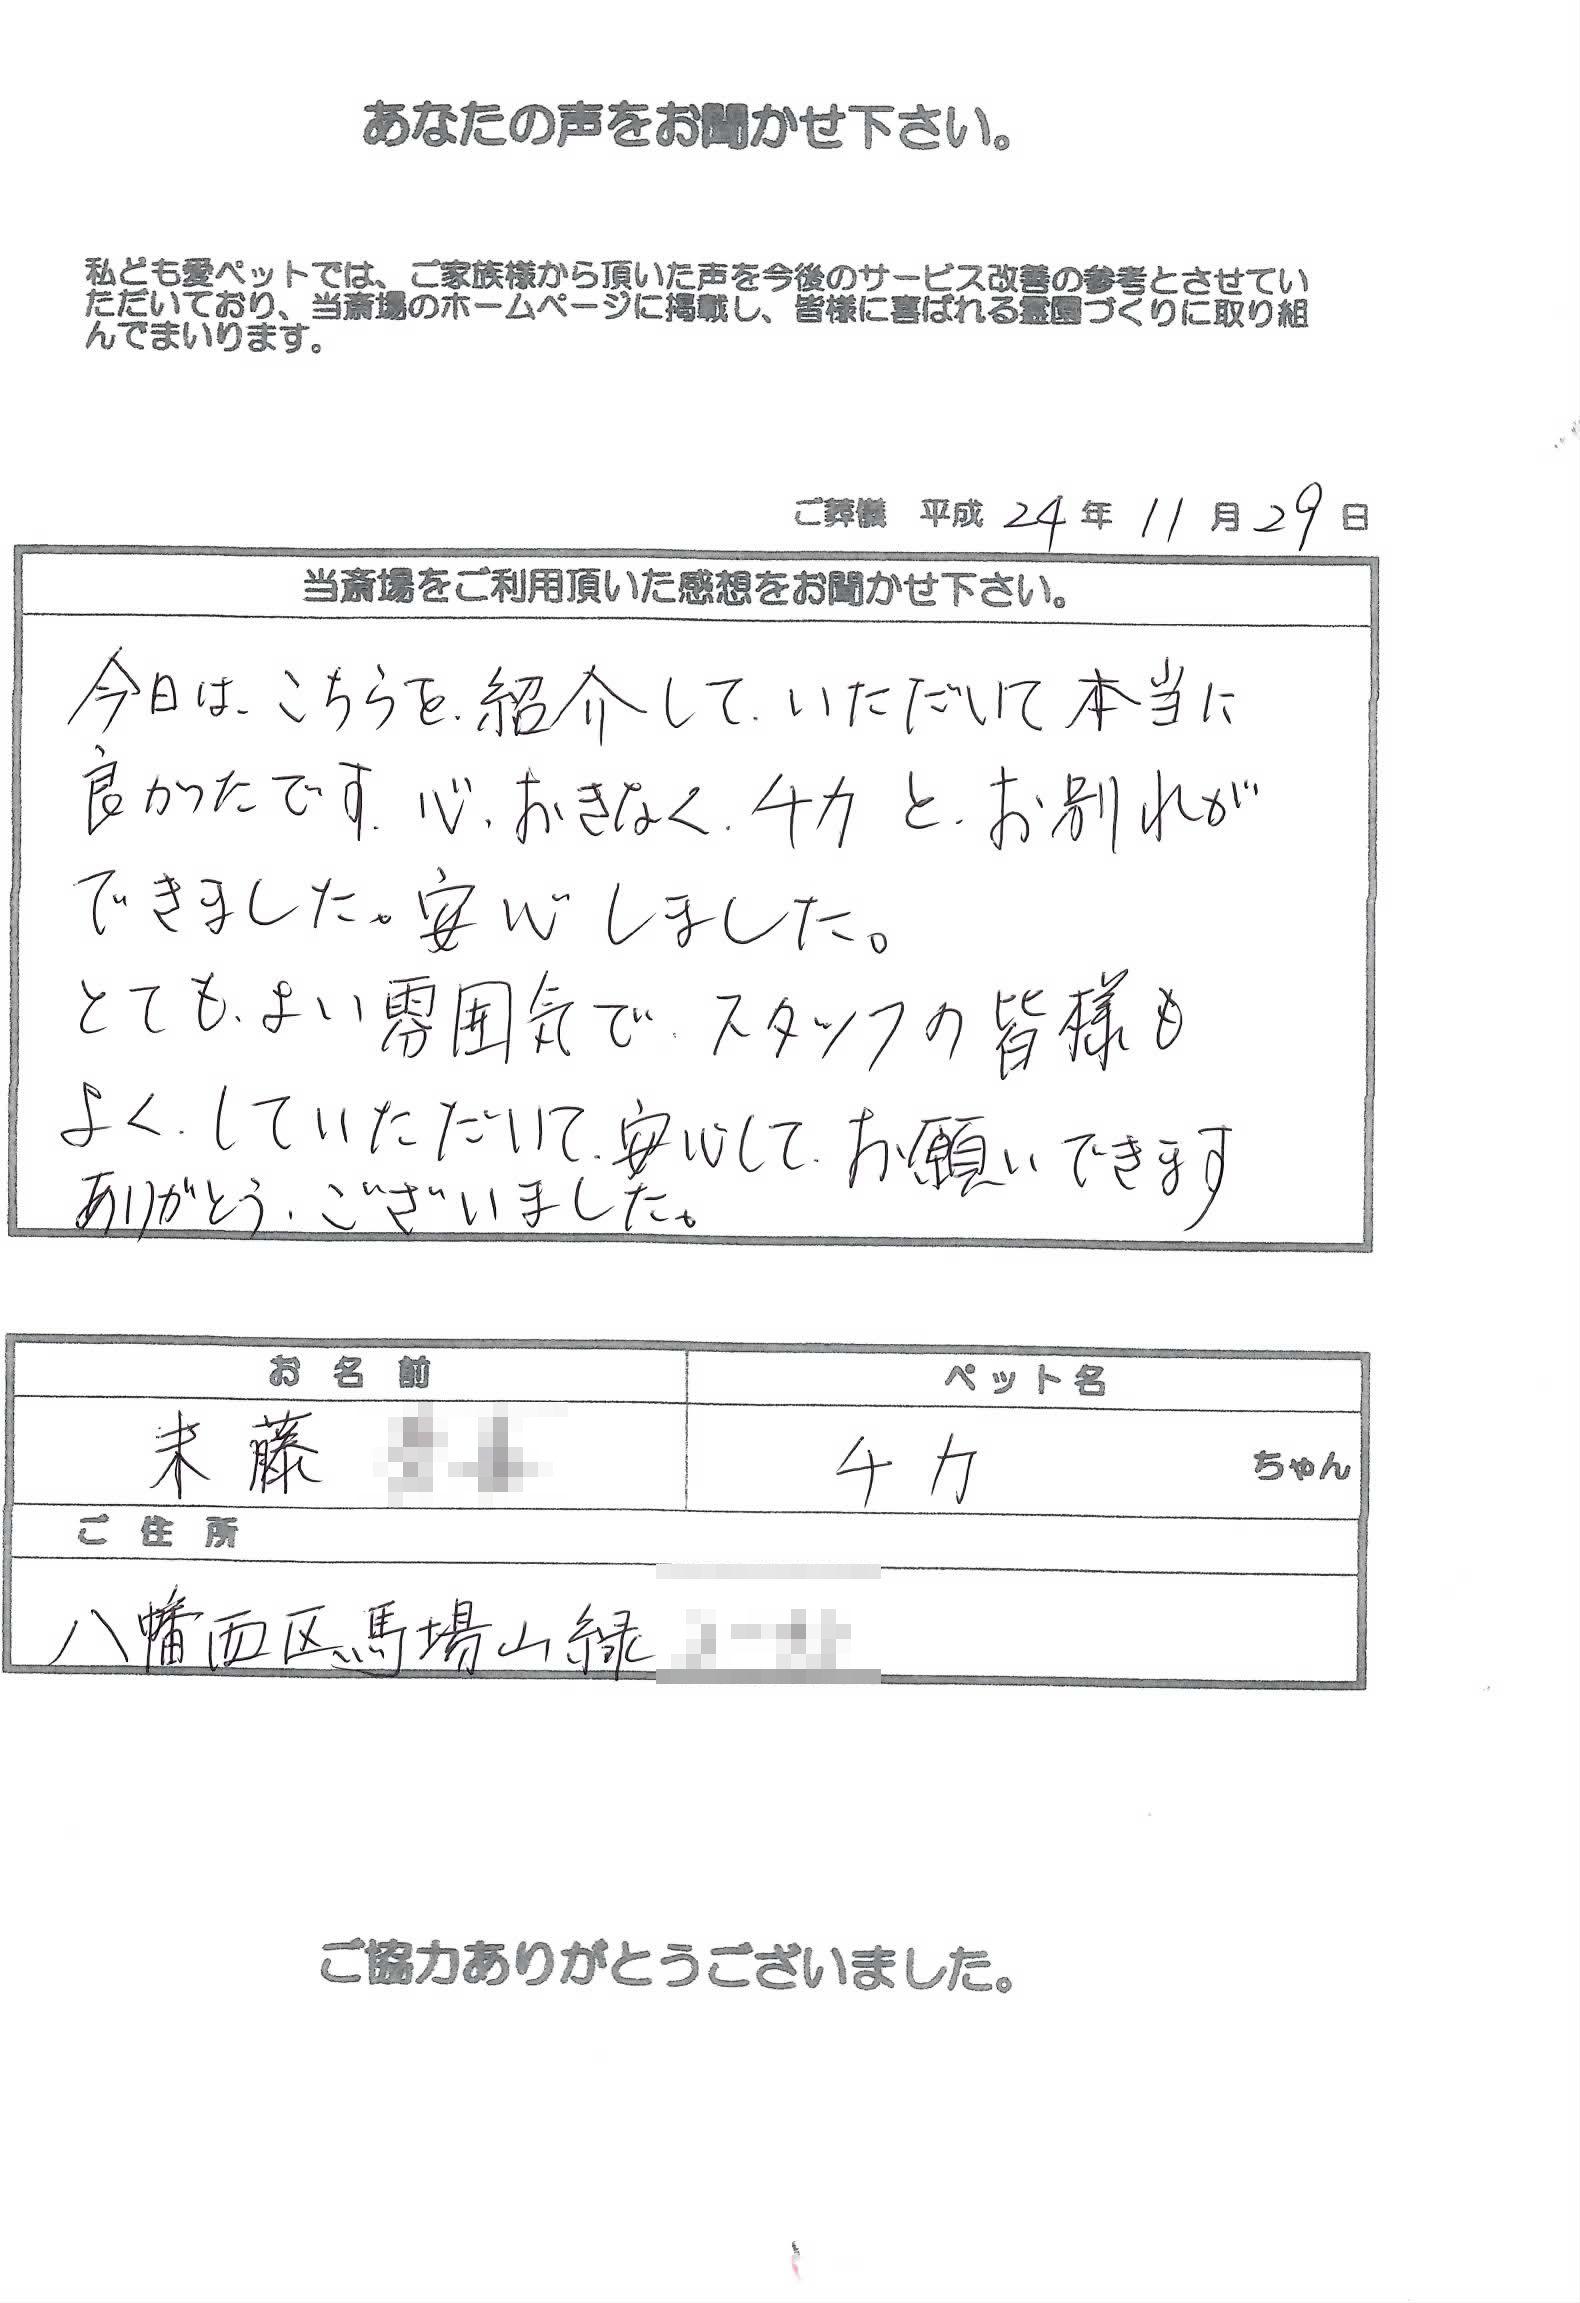 k121129-5.jpg